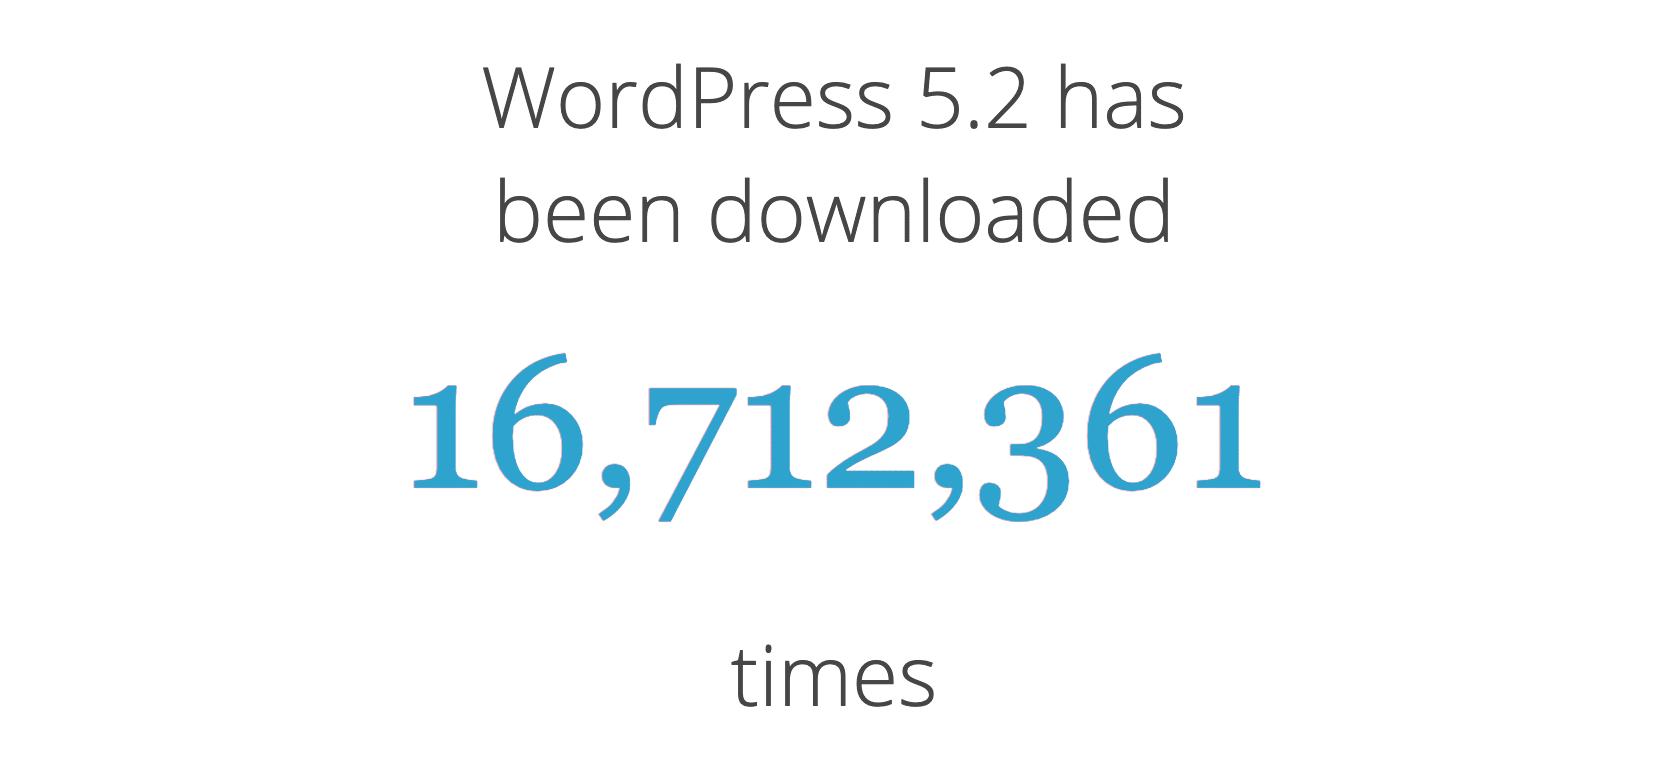 WordPress 5.2 nedladdningsantal